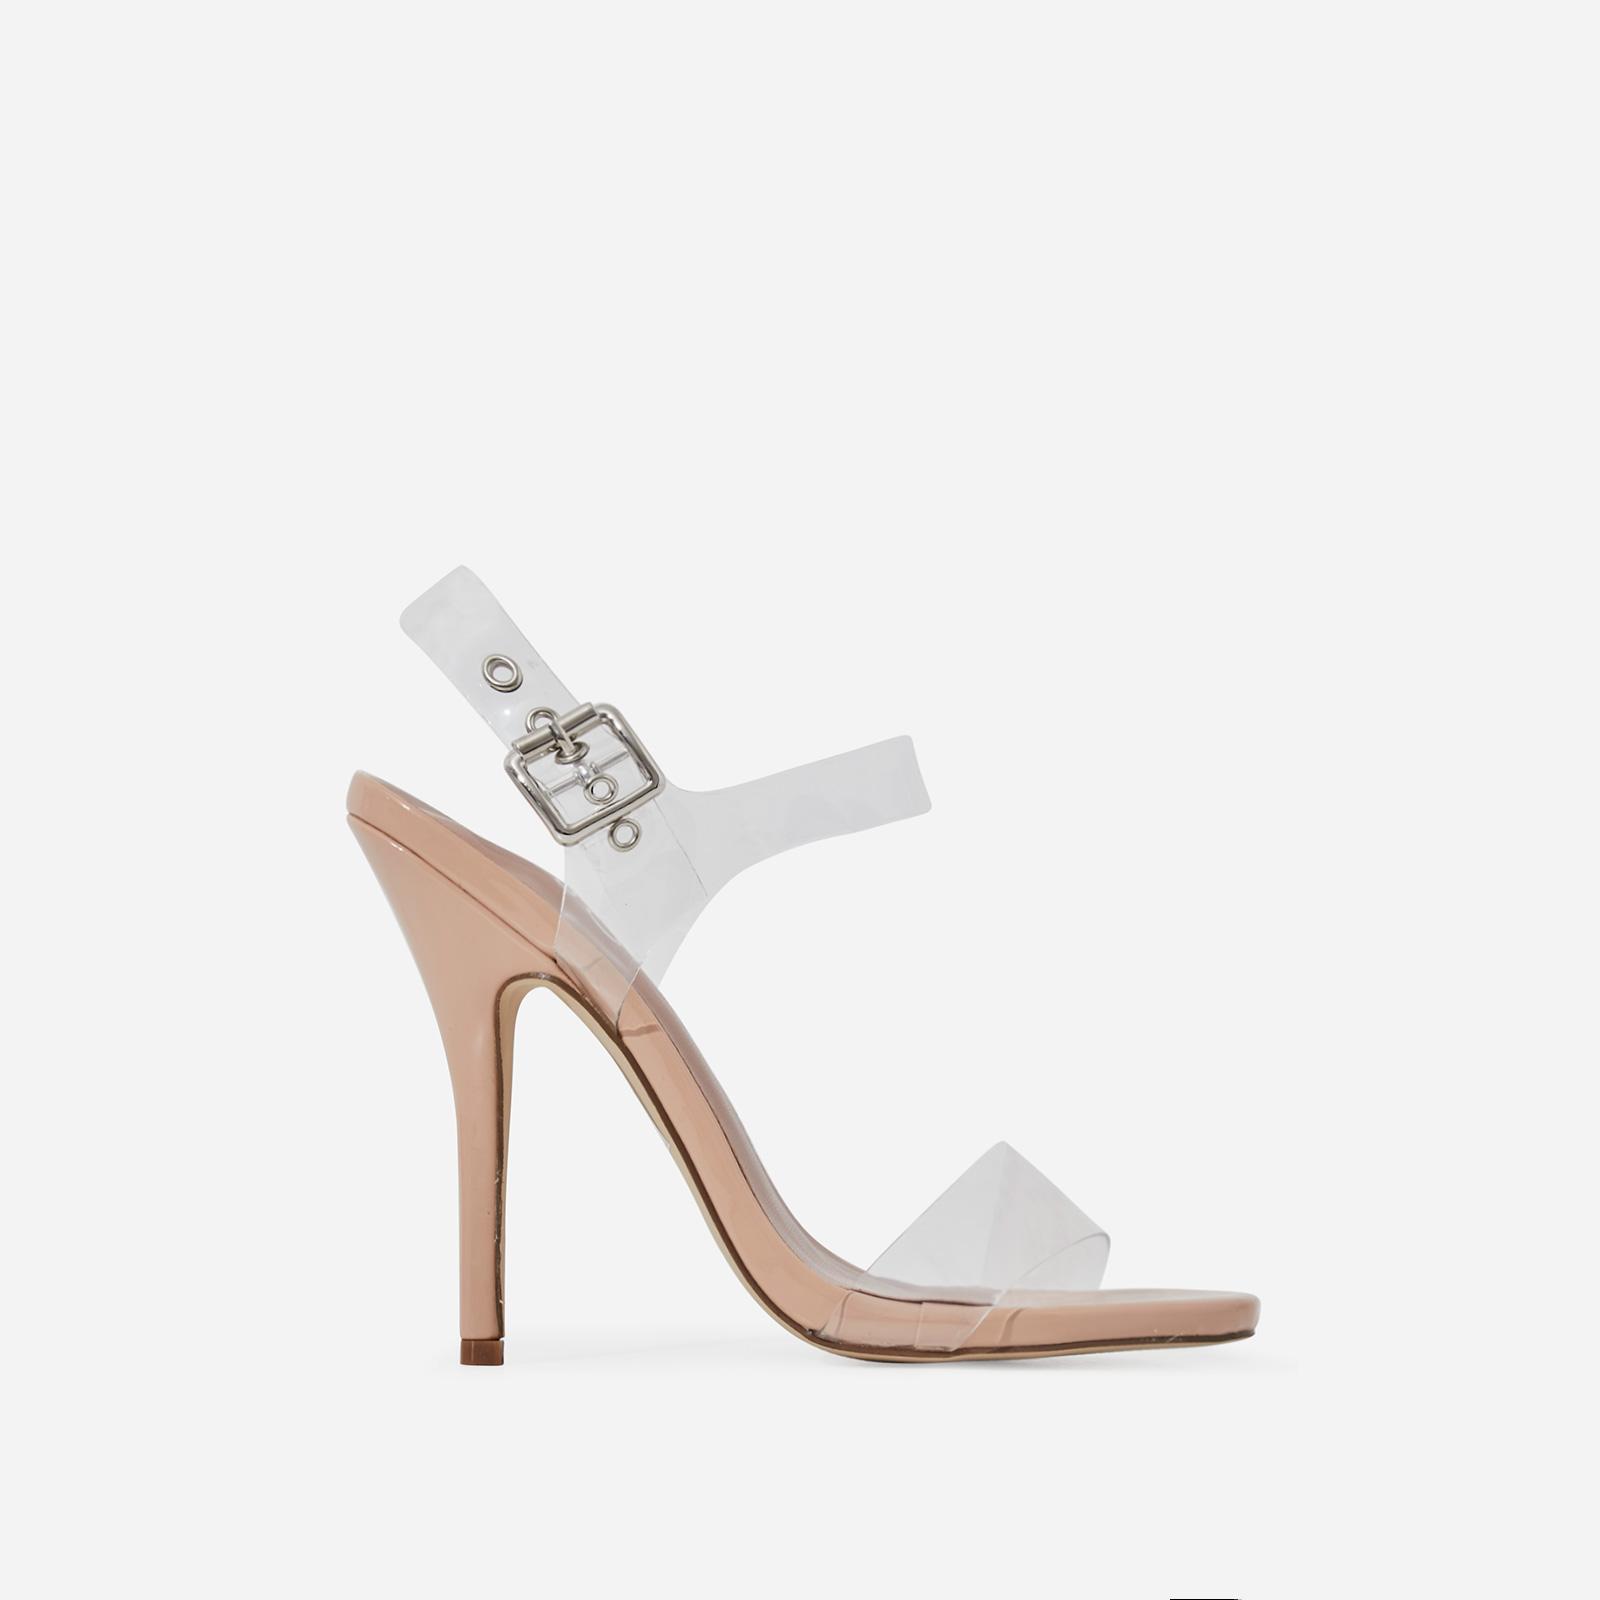 Opal Perspex Heel In Nude Patent